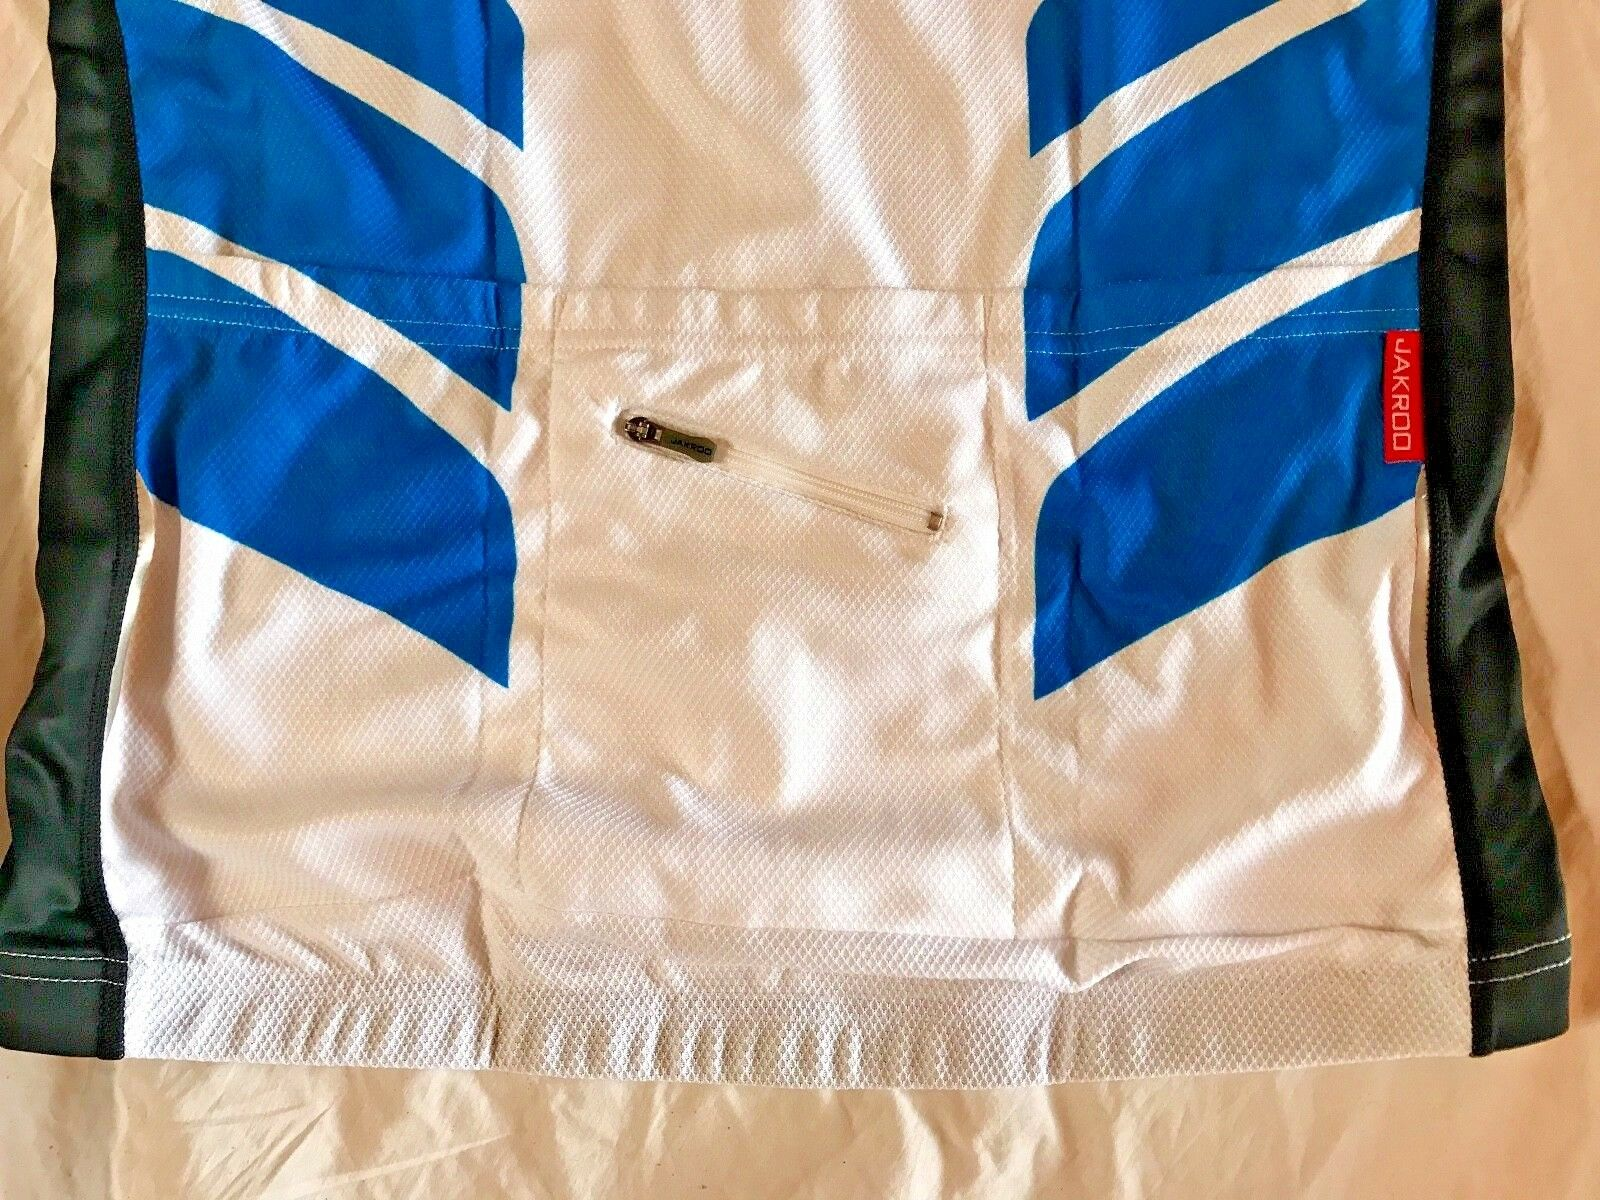 JAKROO Cycling Bike Kit Jersey Shorts Mason TEAM MEDICINE - Virginia Mason Shorts Damens L M 4d8a72